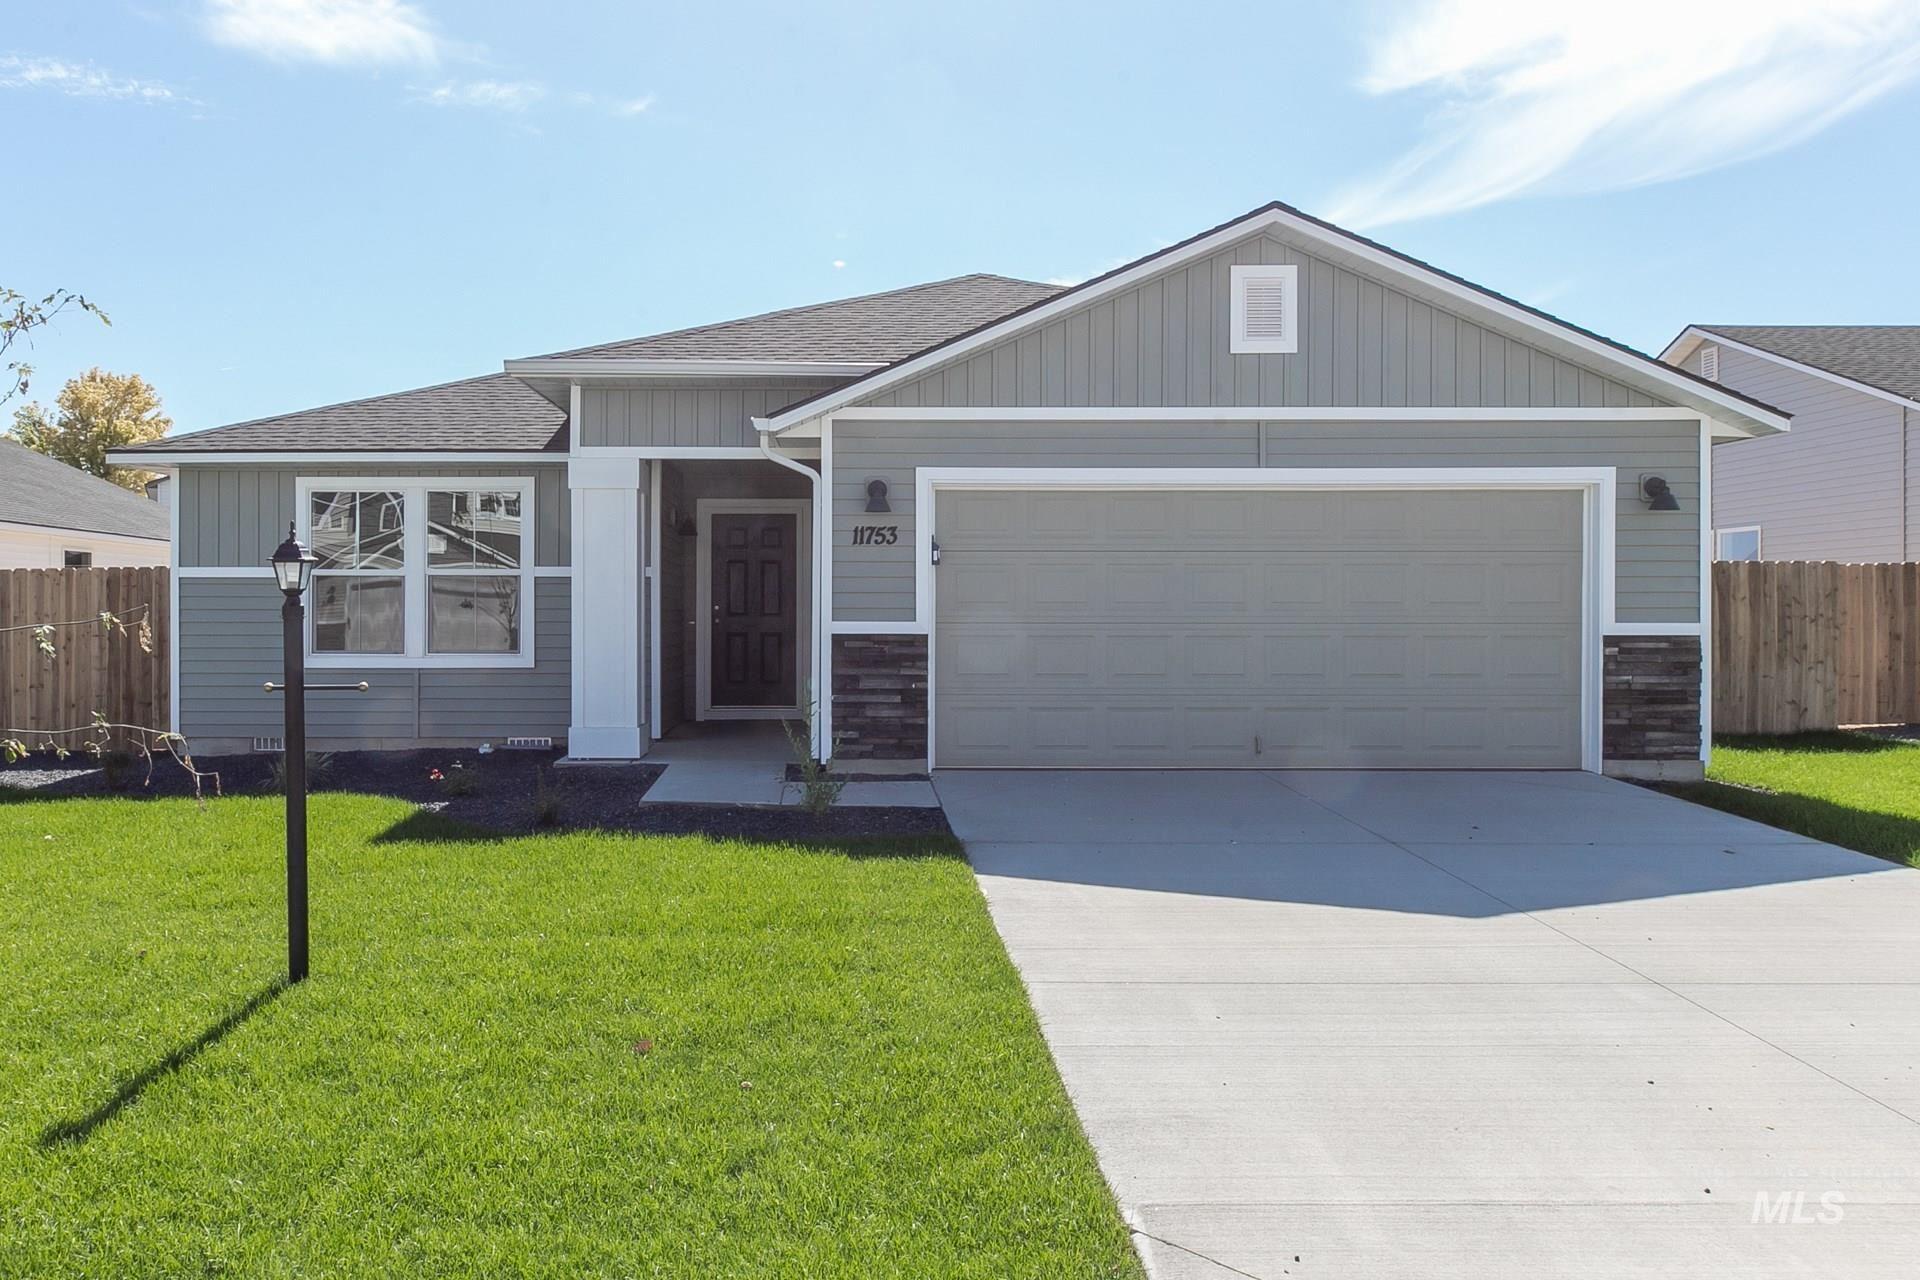 19514 Lenox Ave., Caldwell, ID 83605 - MLS#: 98777824